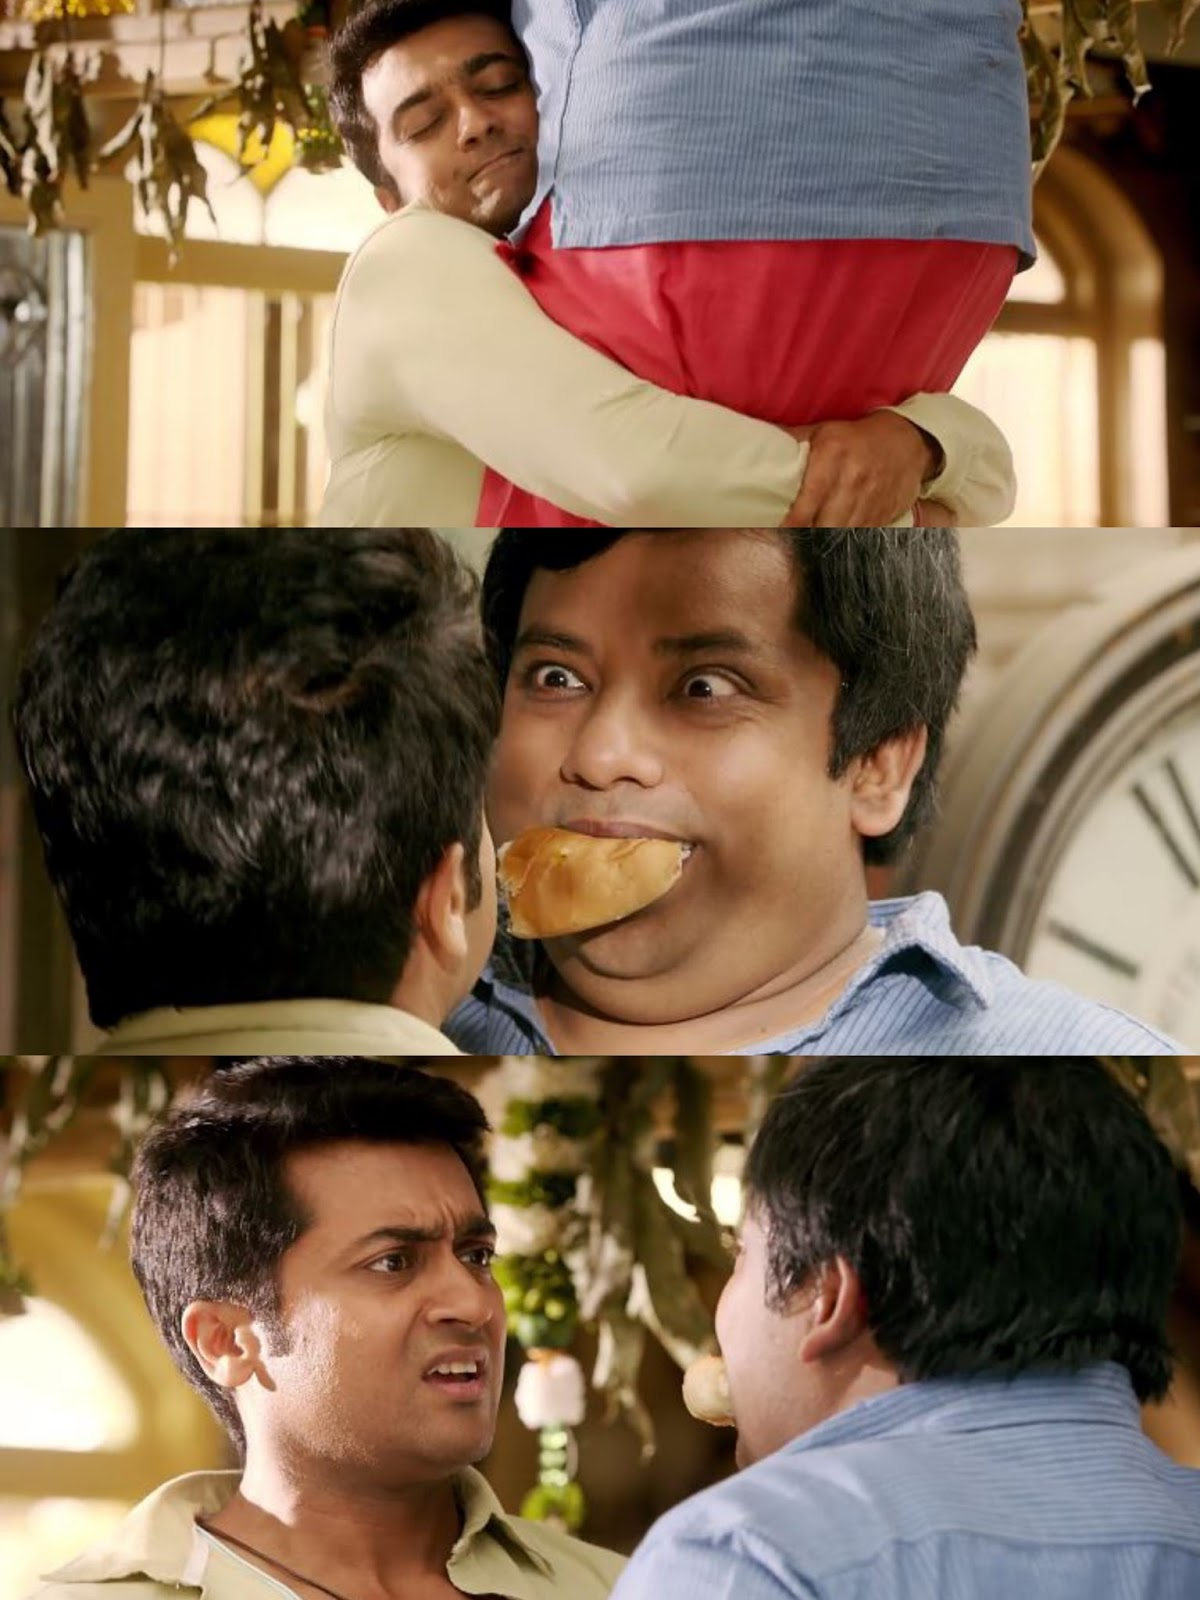 Karthick Raja Memes 24 Movie Meme Templates